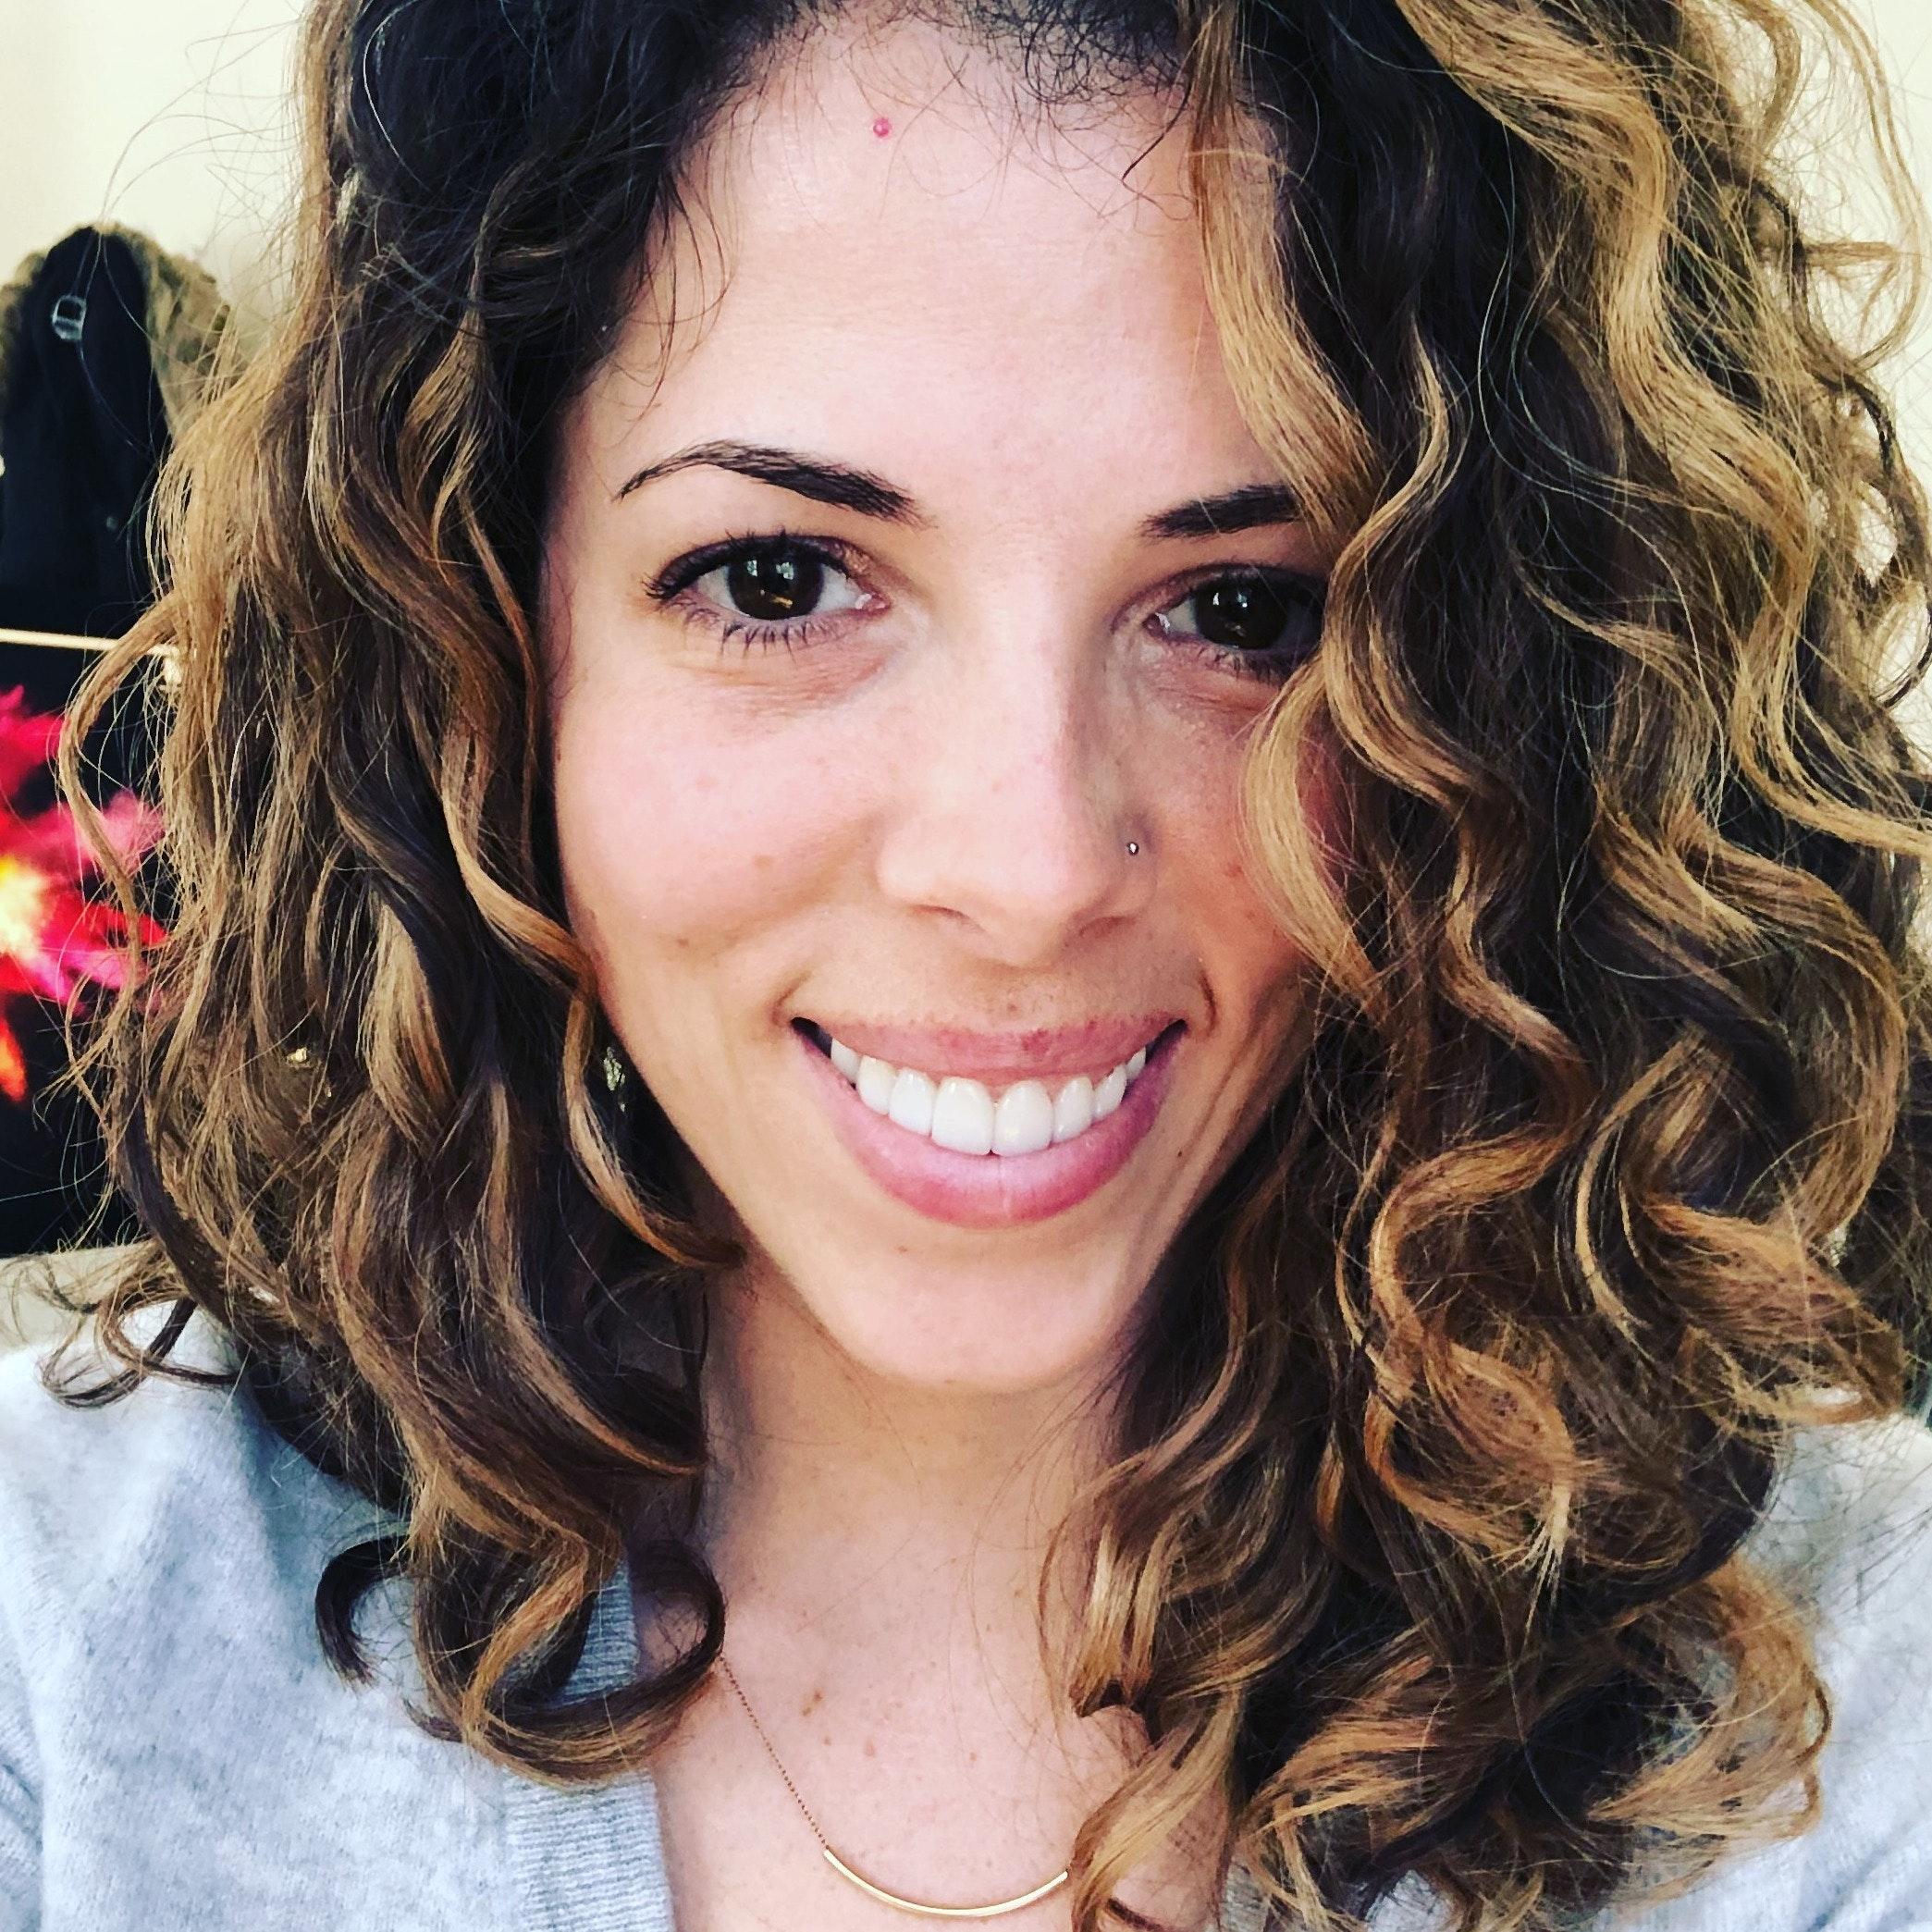 Danielle O.